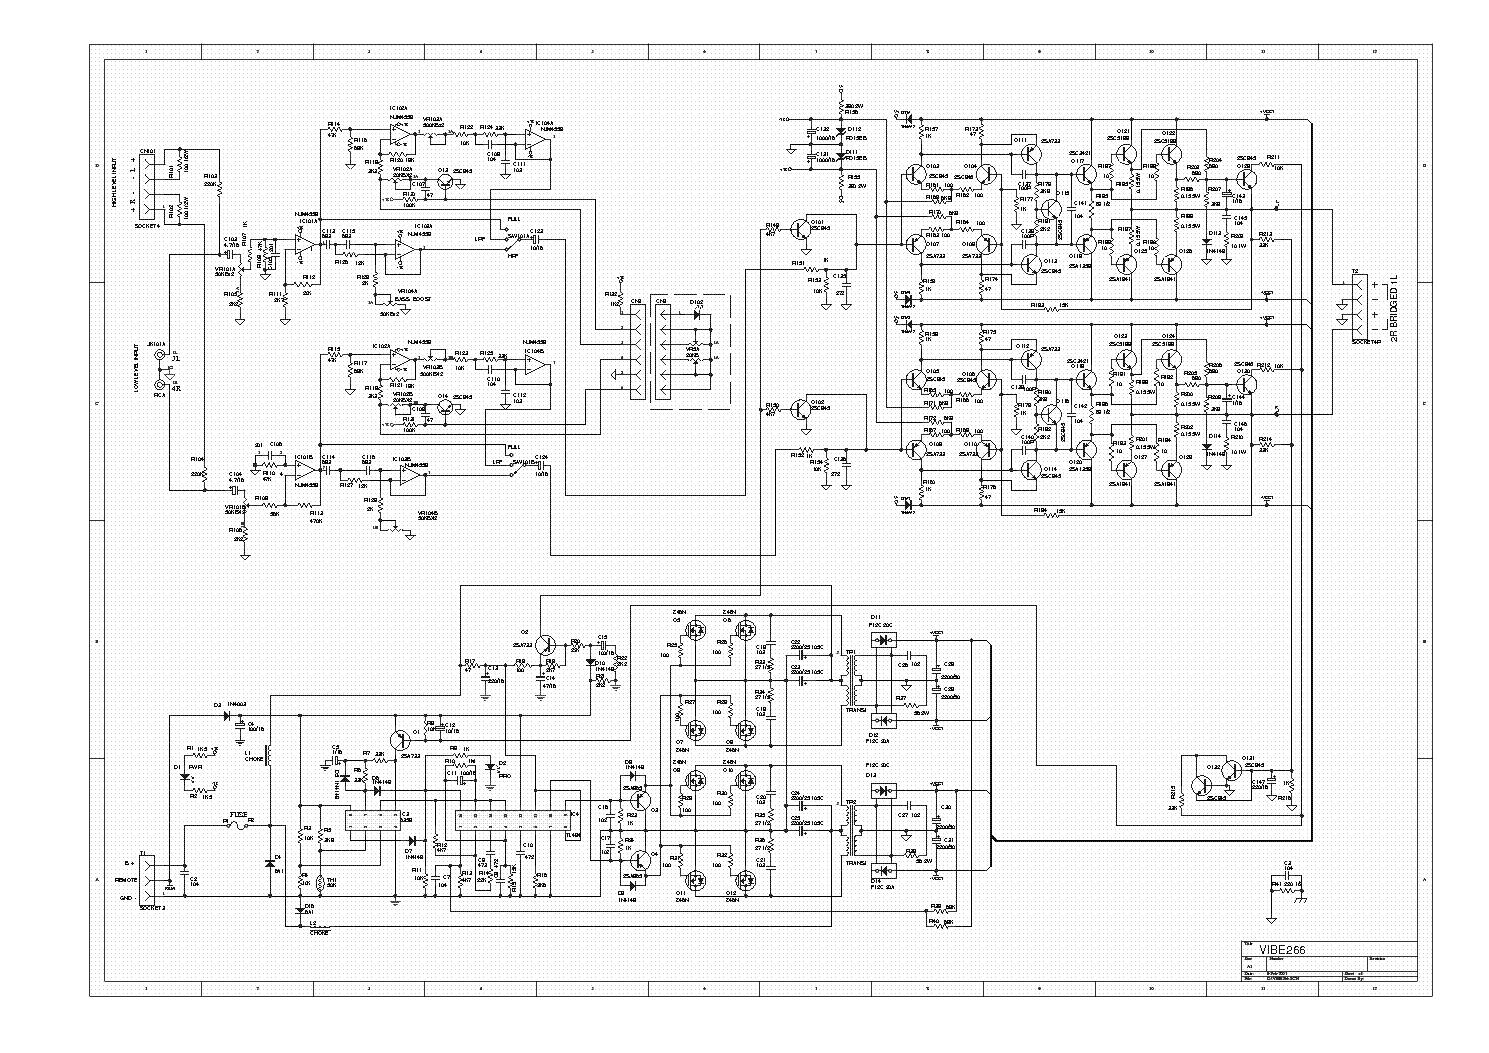 lanzar vibe266 car amplifier sch service manual download  schematics  eeprom  repair info for